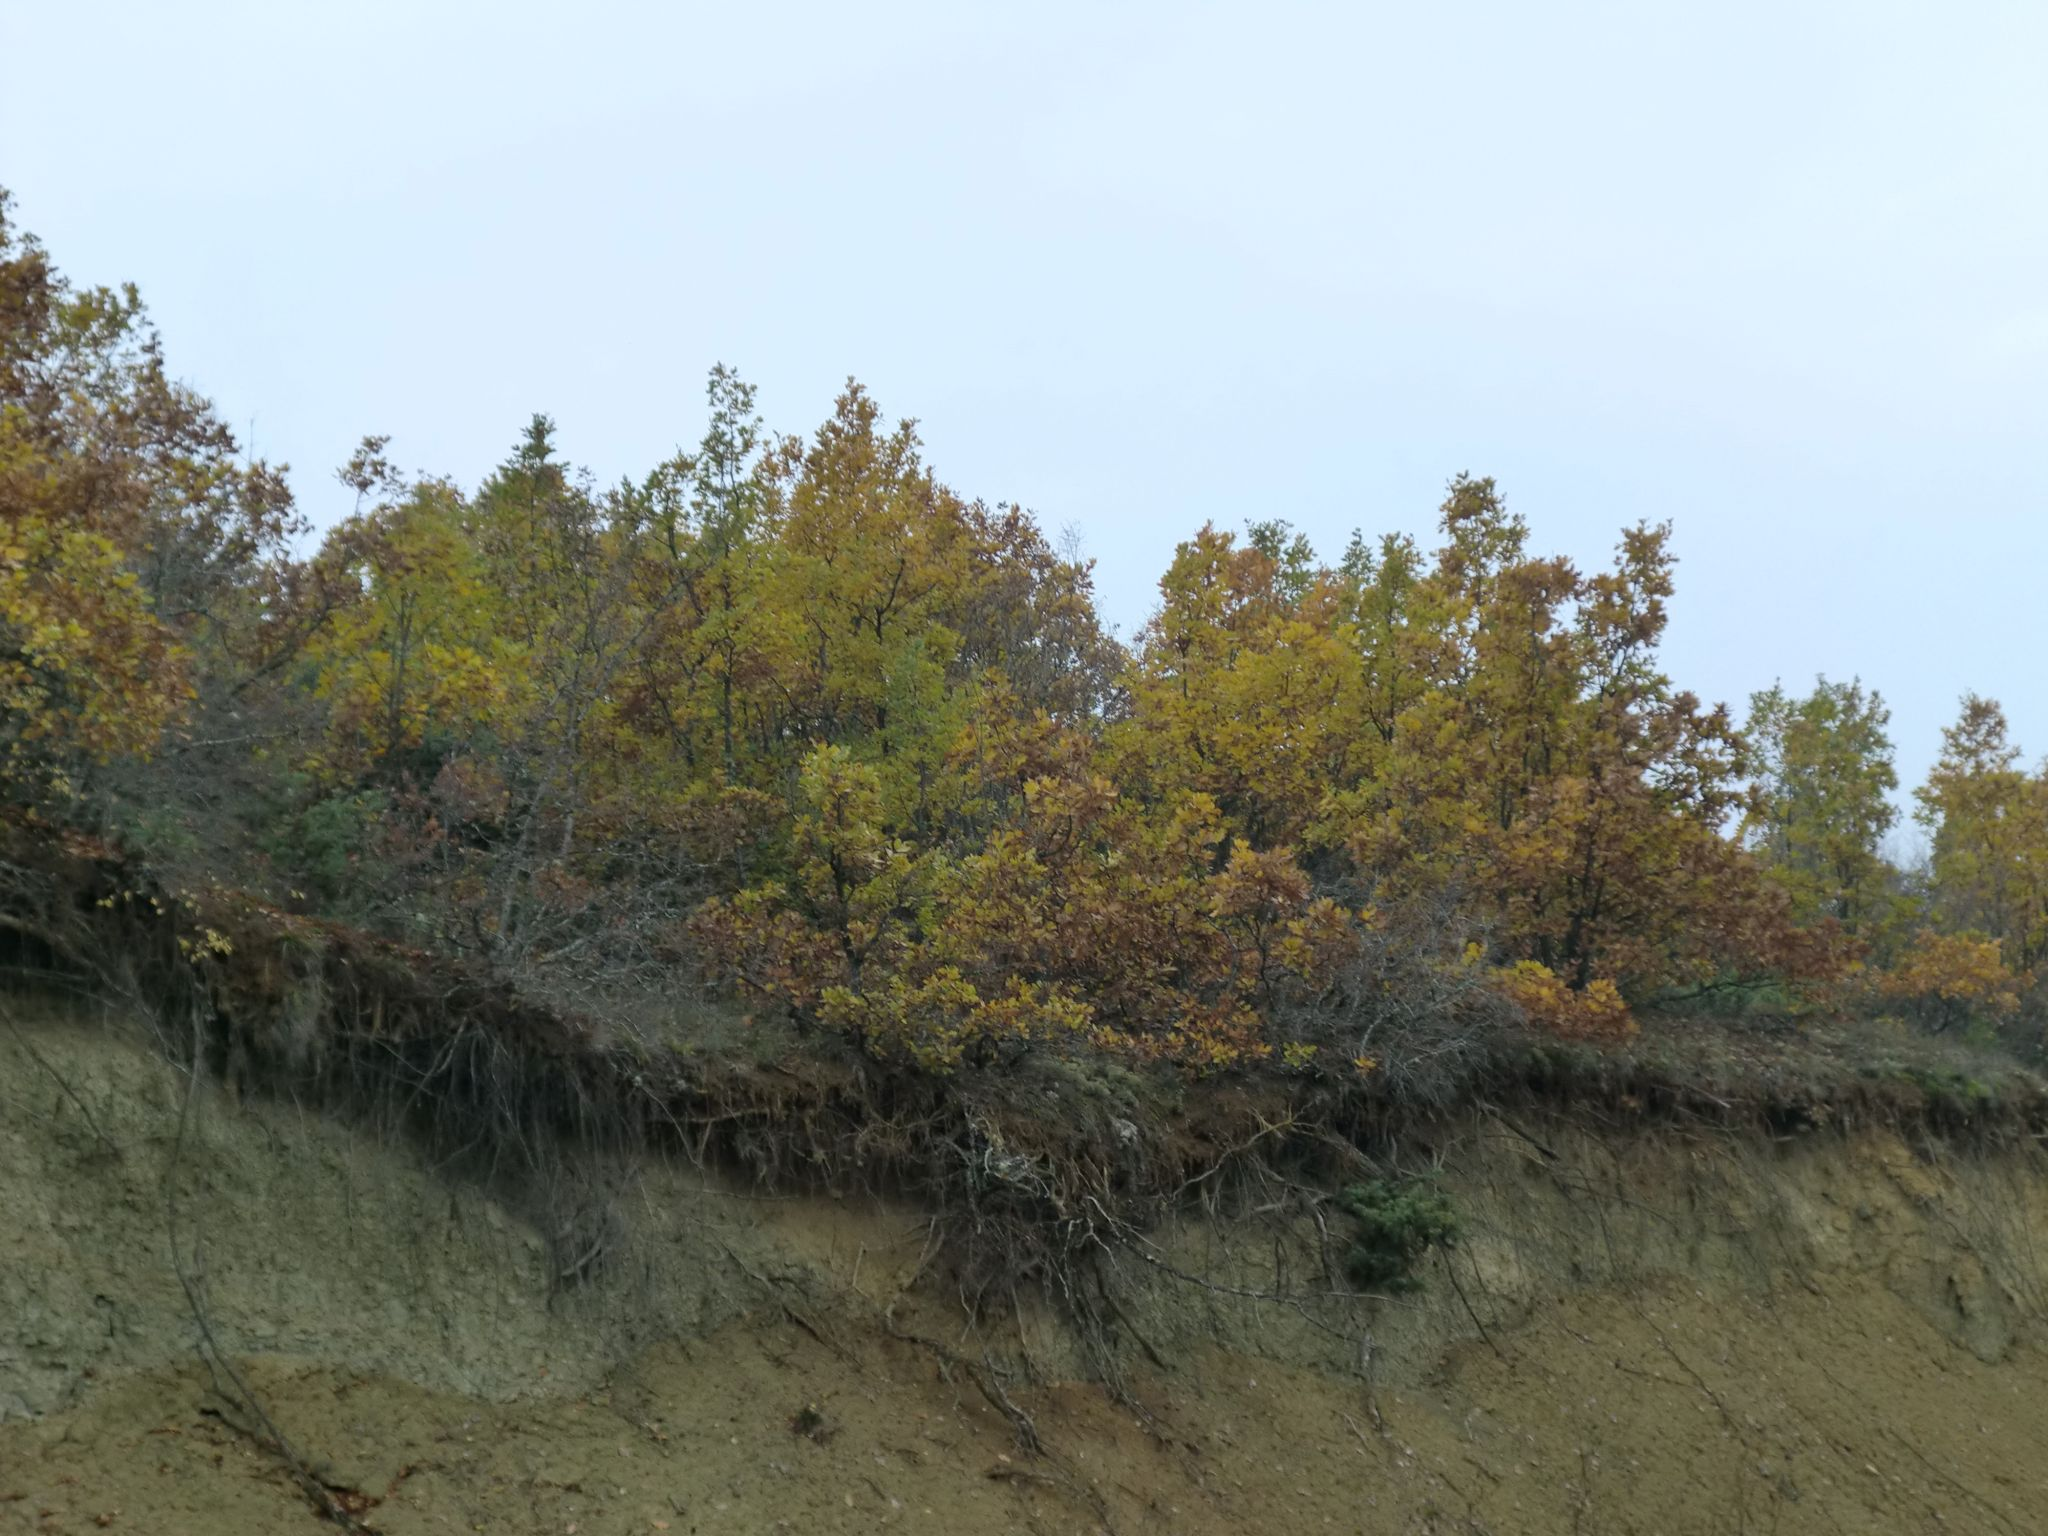 CIMG0297 - Macedonian landscapes